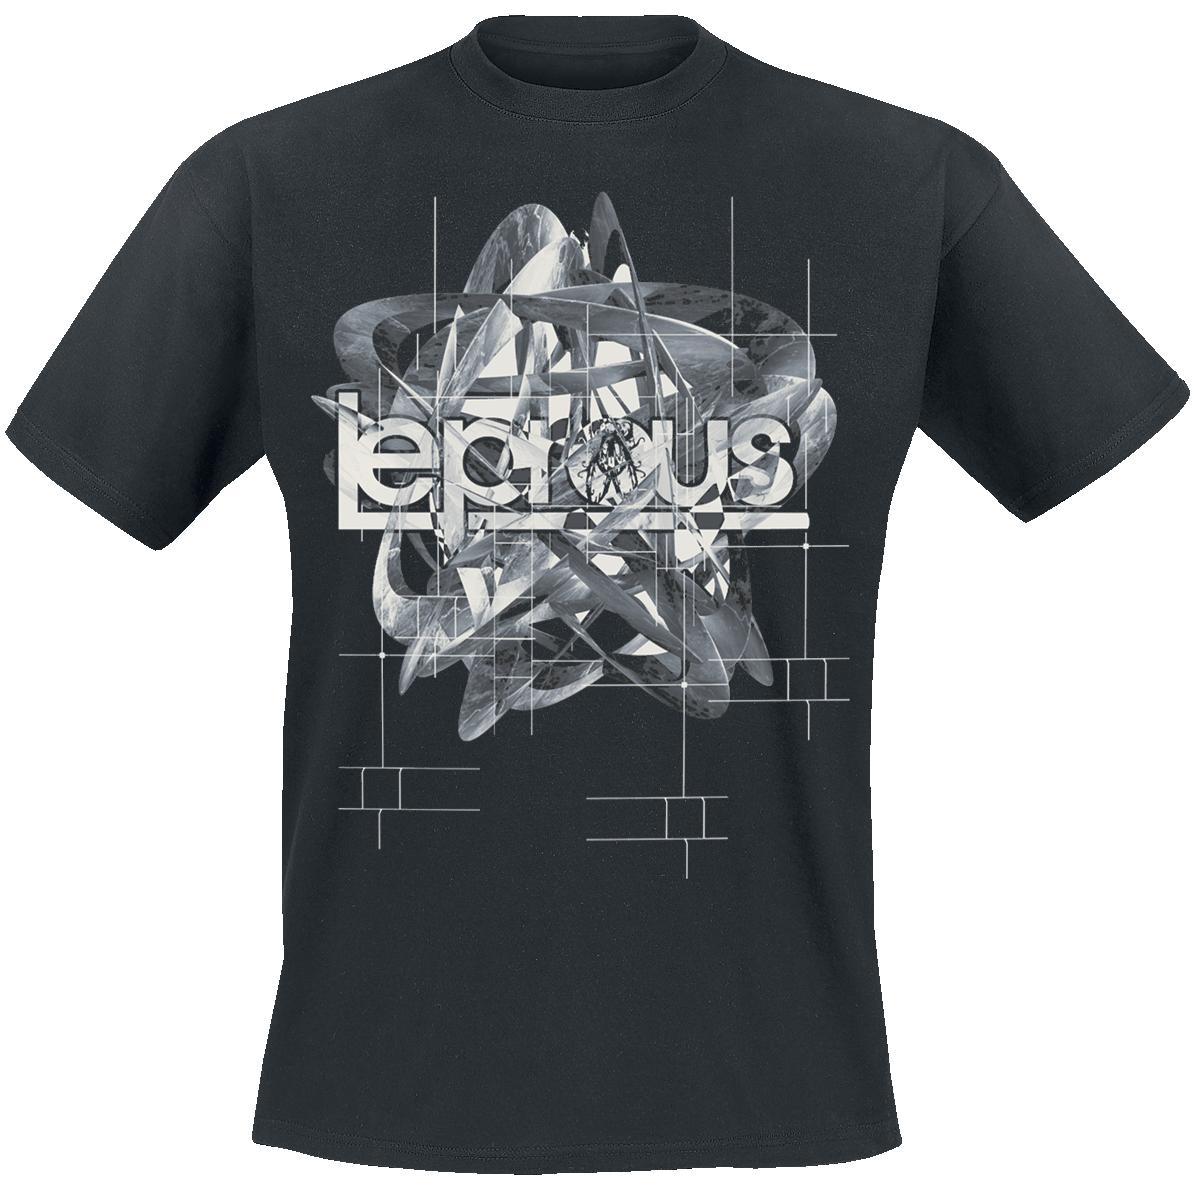 Leprous - The Star - T-Shirt - black image